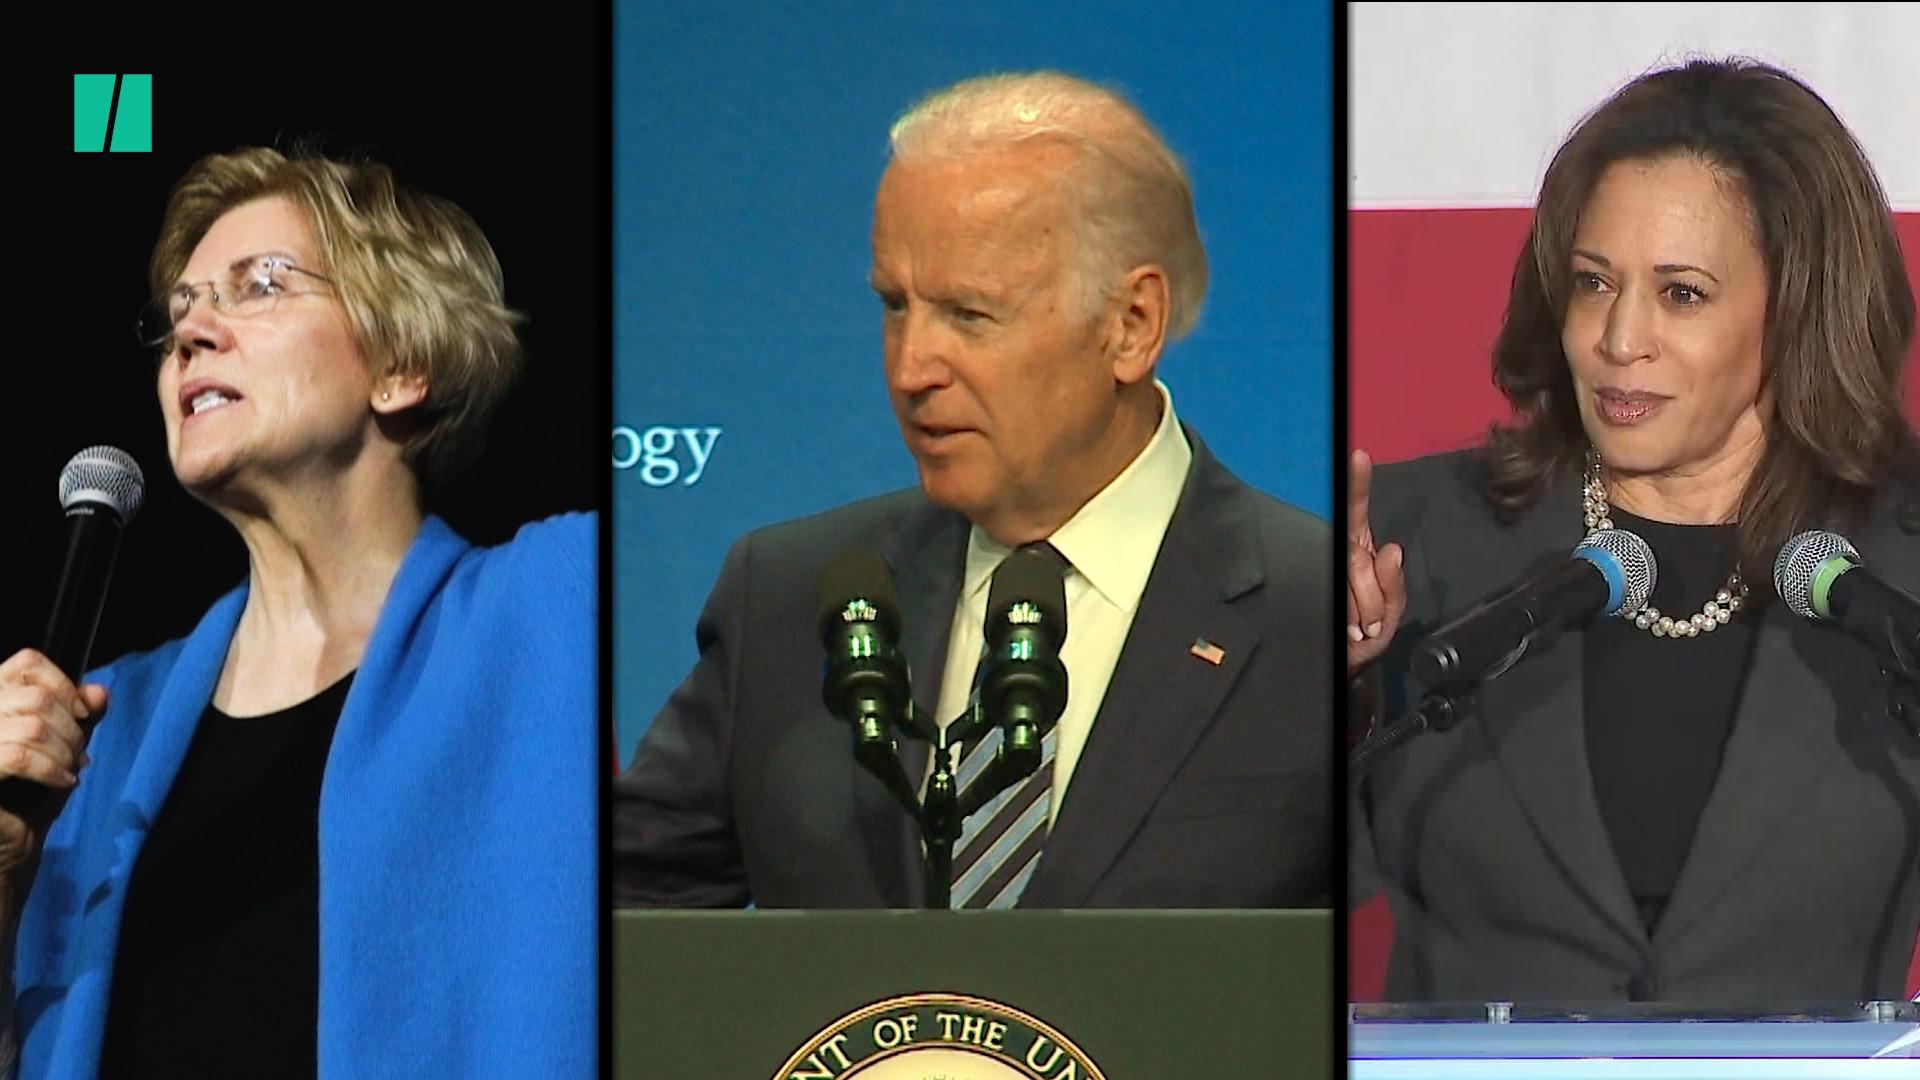 5 Takeaways From The First 2020 Democratic Presidential Debate